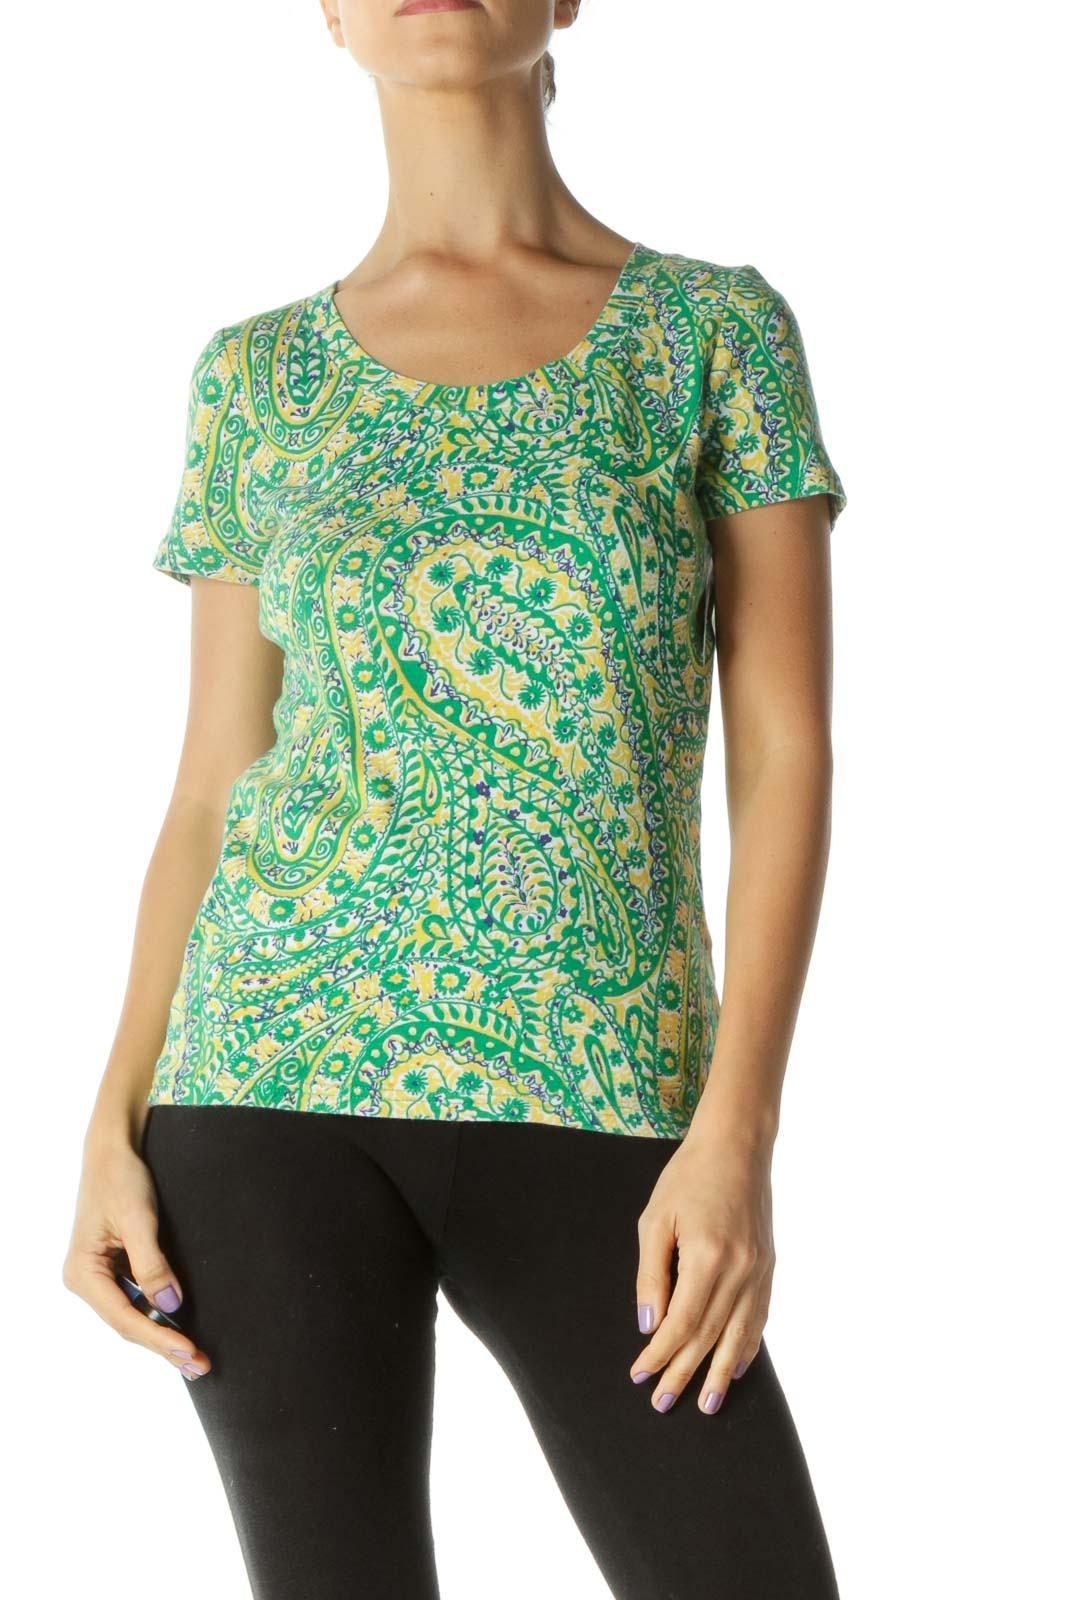 Green Yellow Blue Paisleys Print T-Shirt